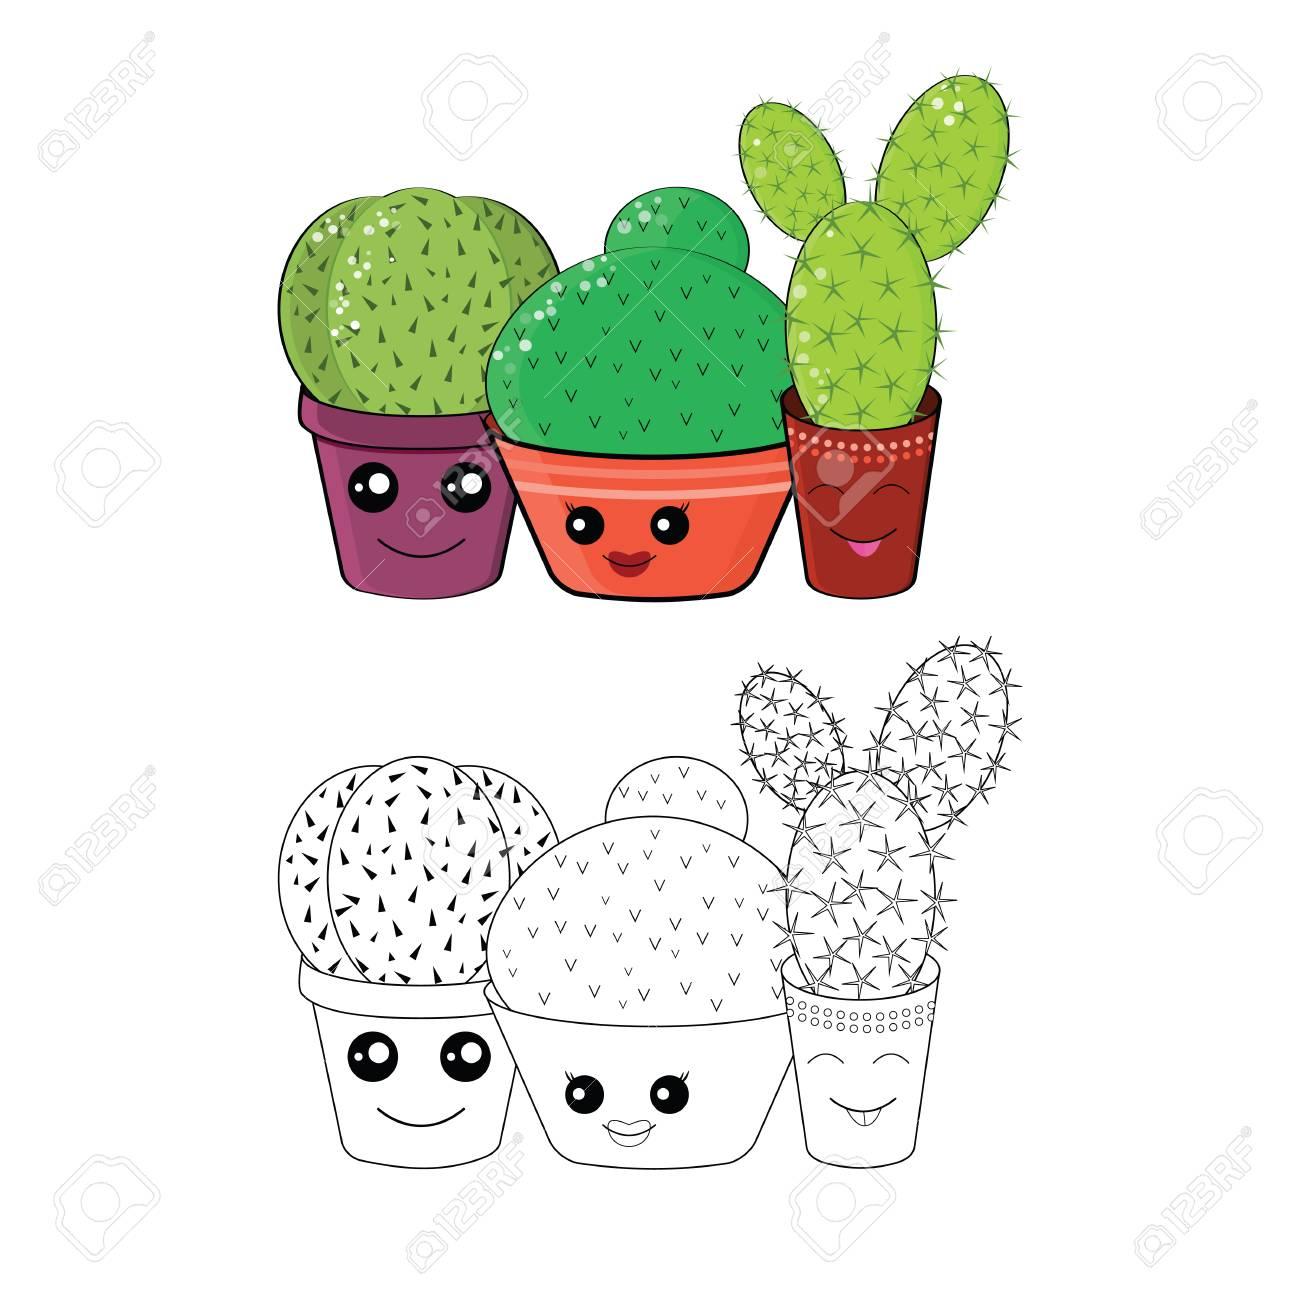 Kostenlose Malvorlage Kaktus Coloring And Malvorlagan